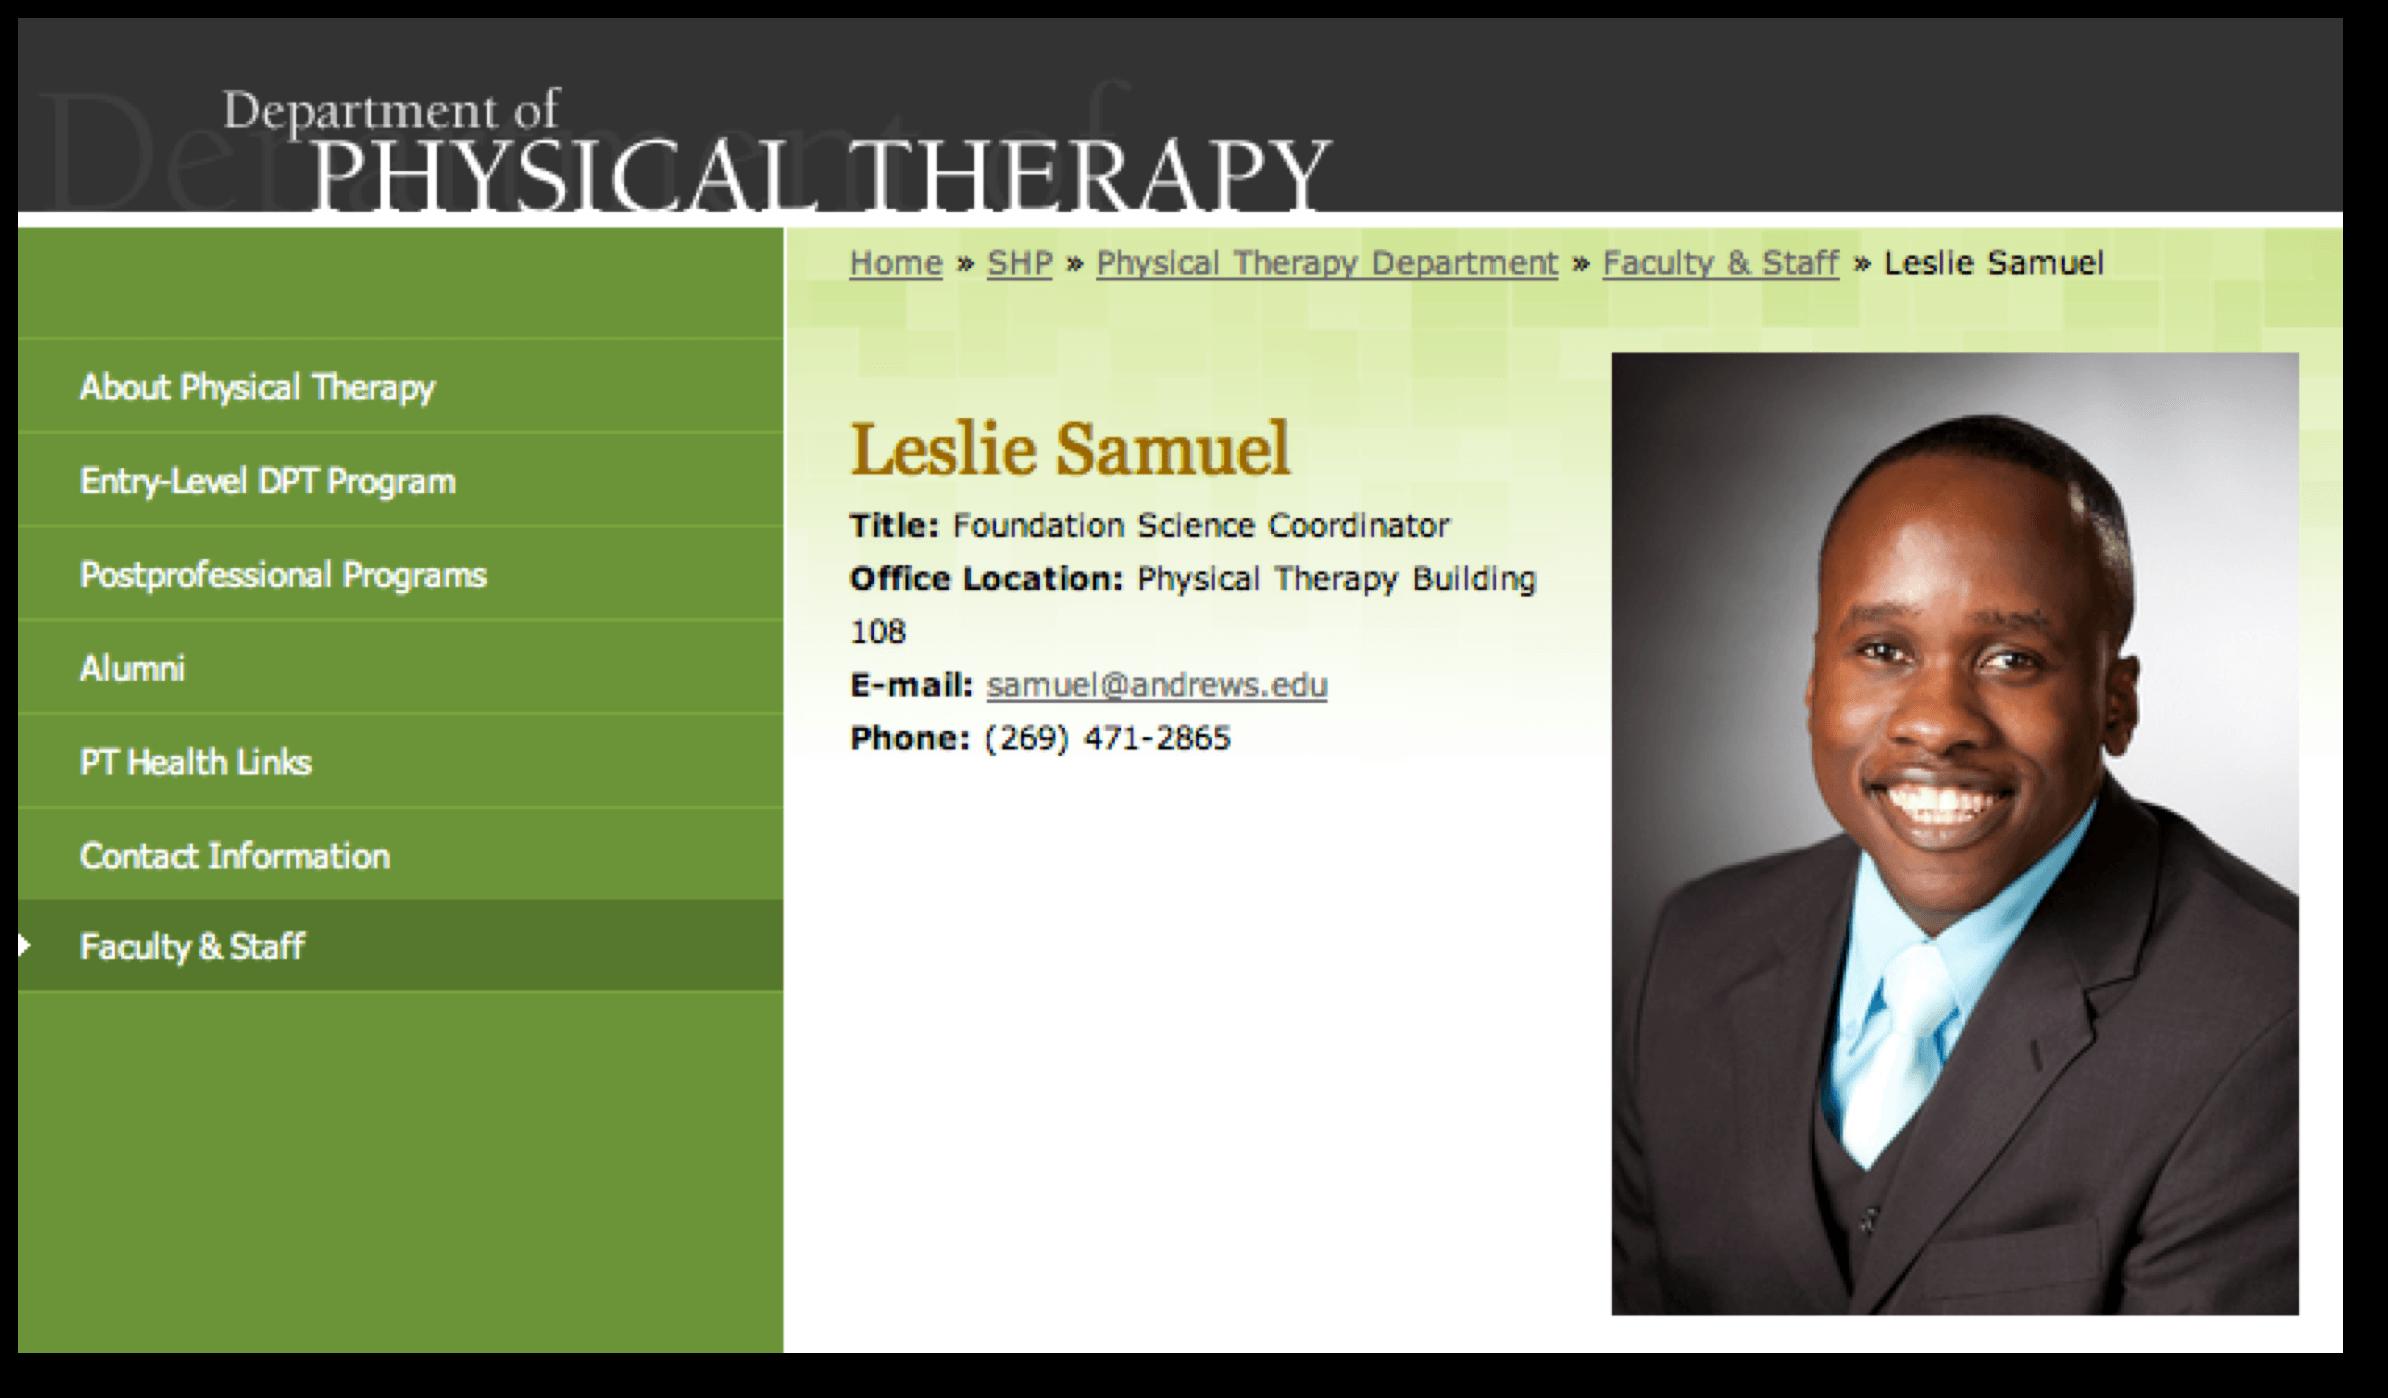 Professor Leslie Samuel